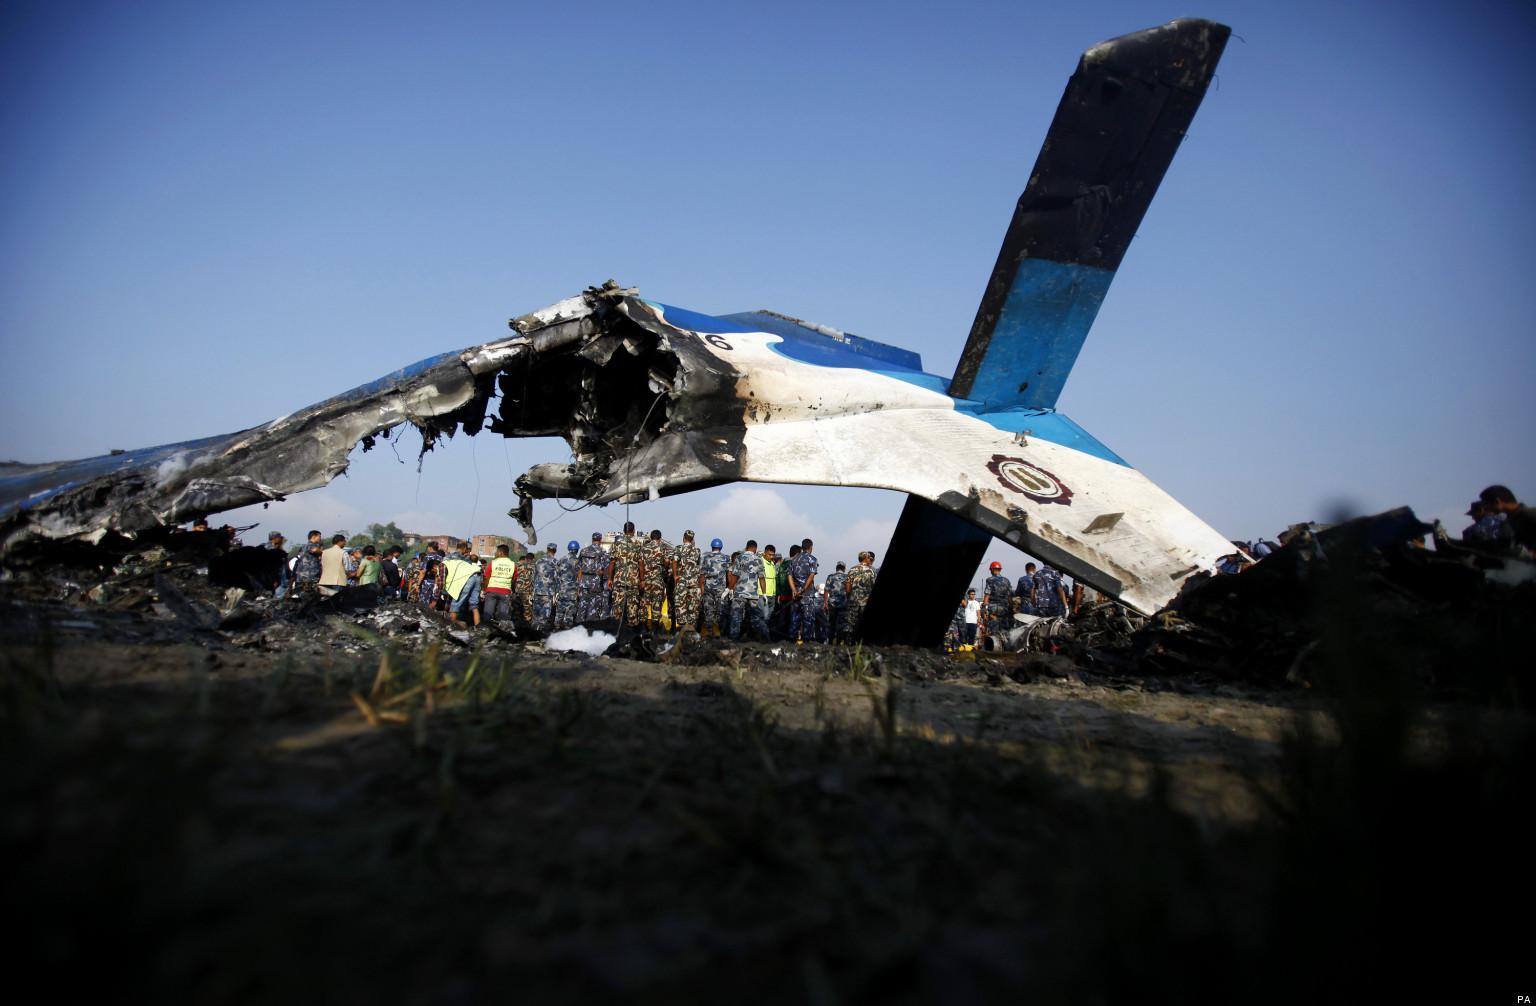 kathmandu plane crash - photo #32